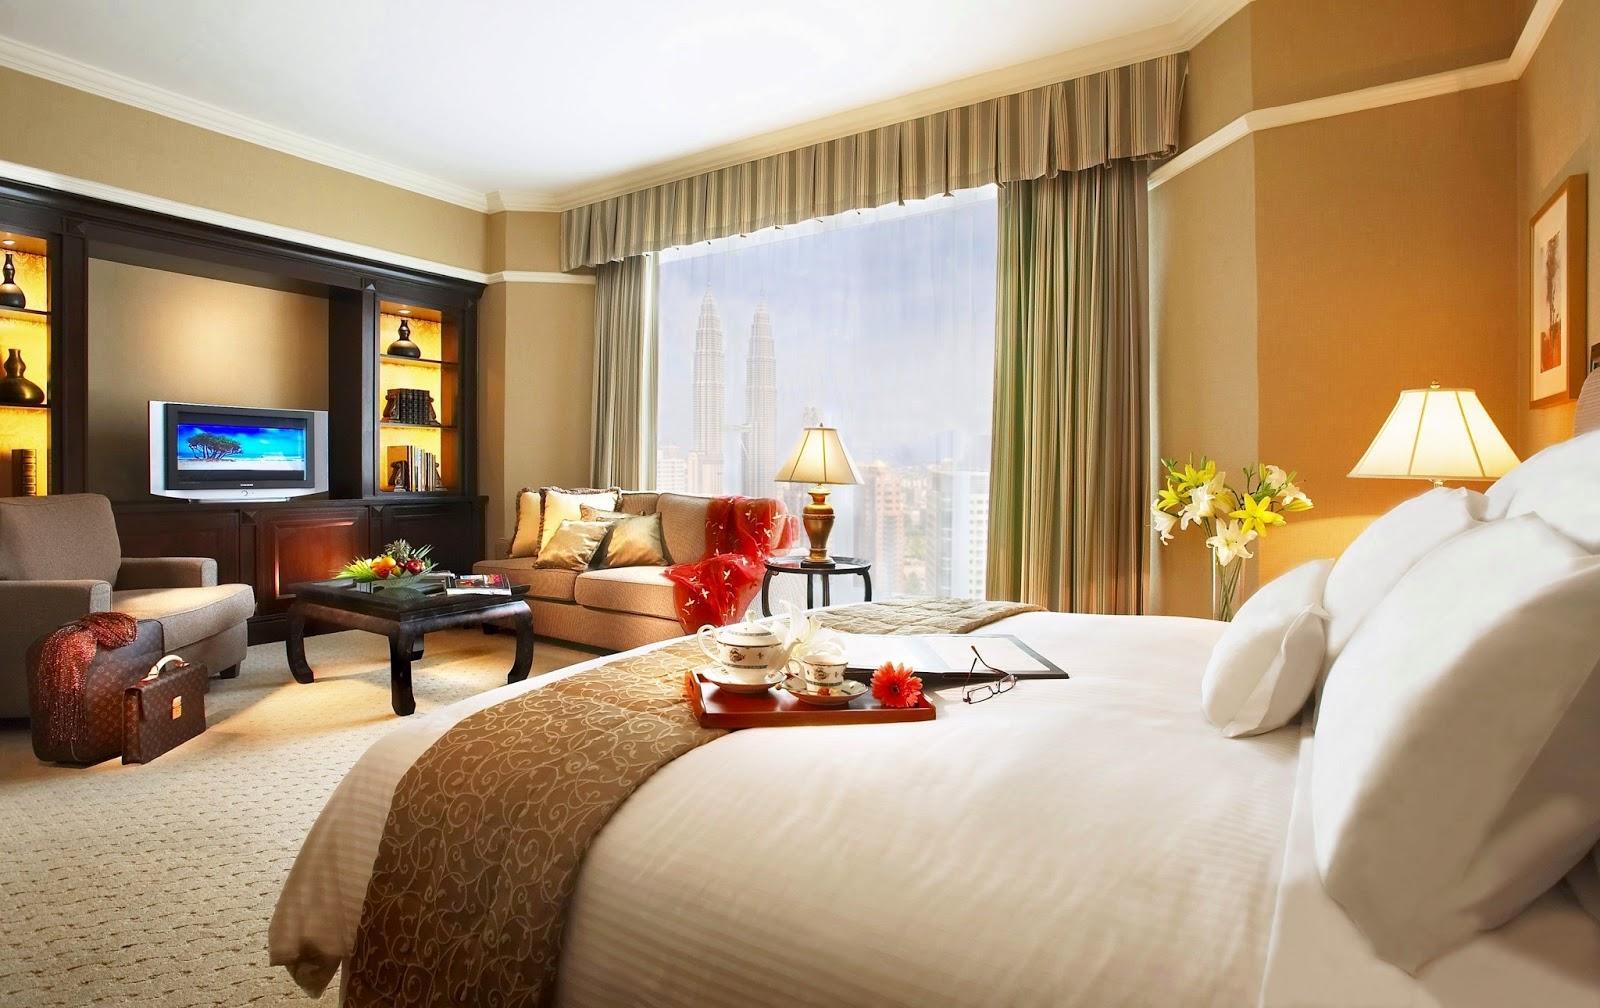 hotel-luxe-ritz-carlton-chambre.jpg